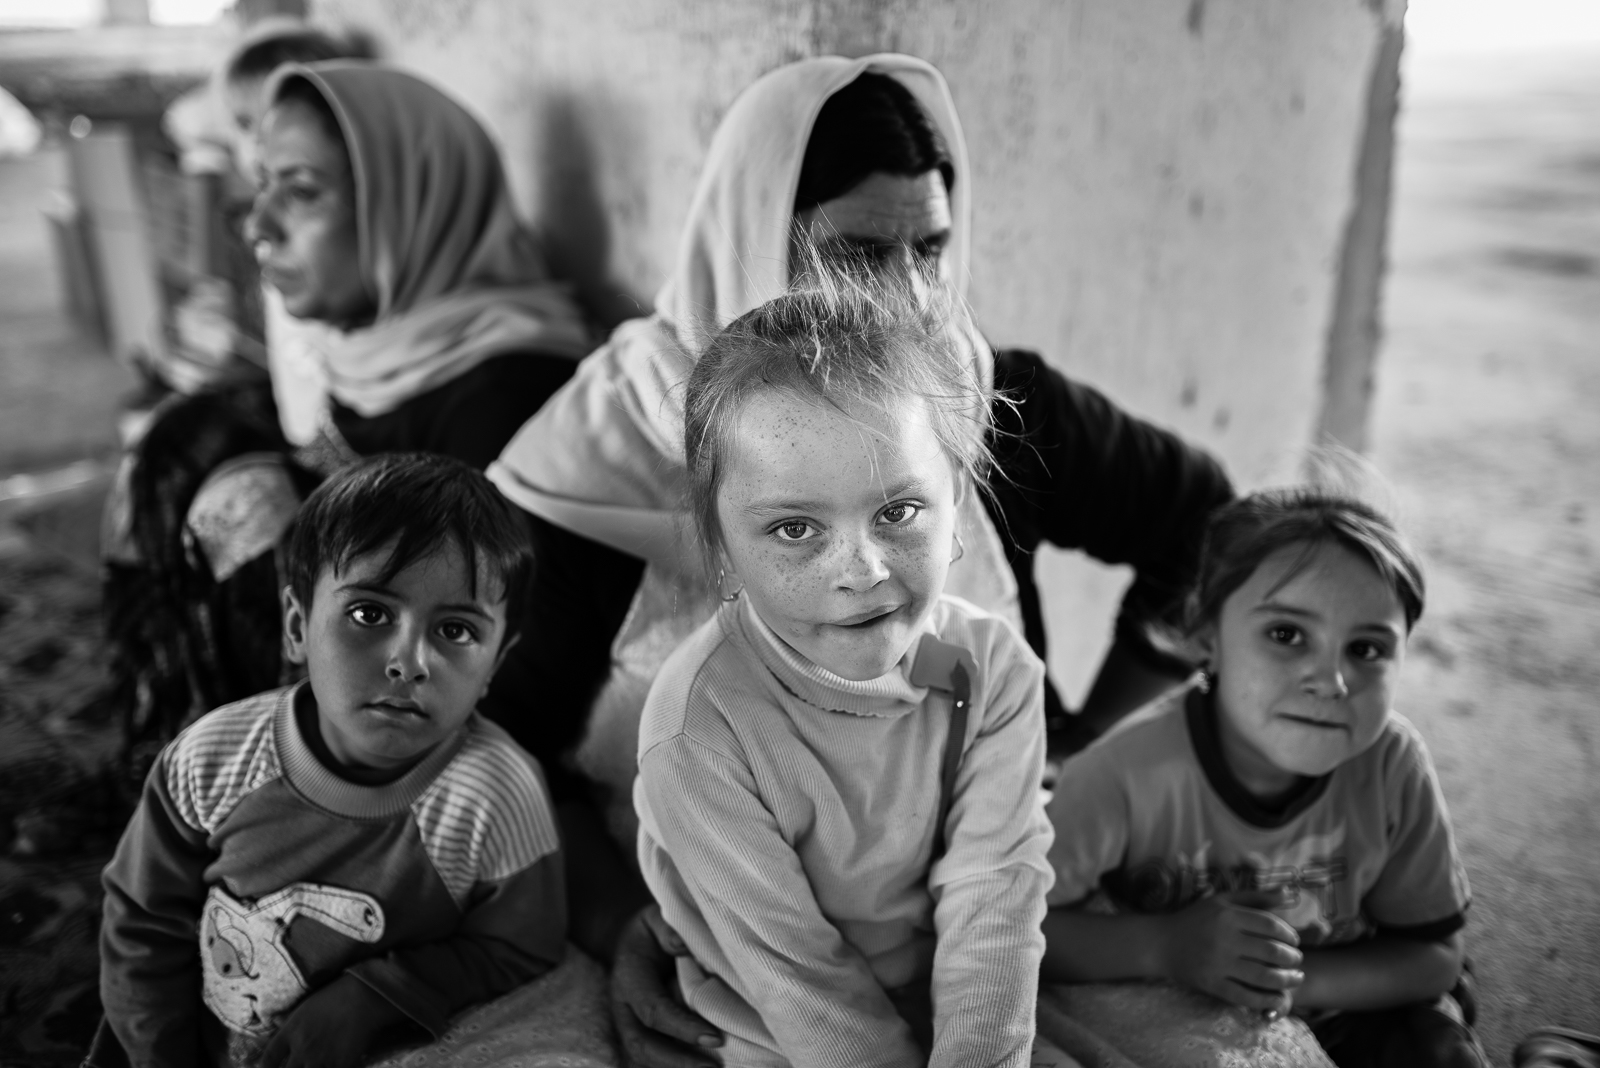 Children inside a building under construction in Zakho